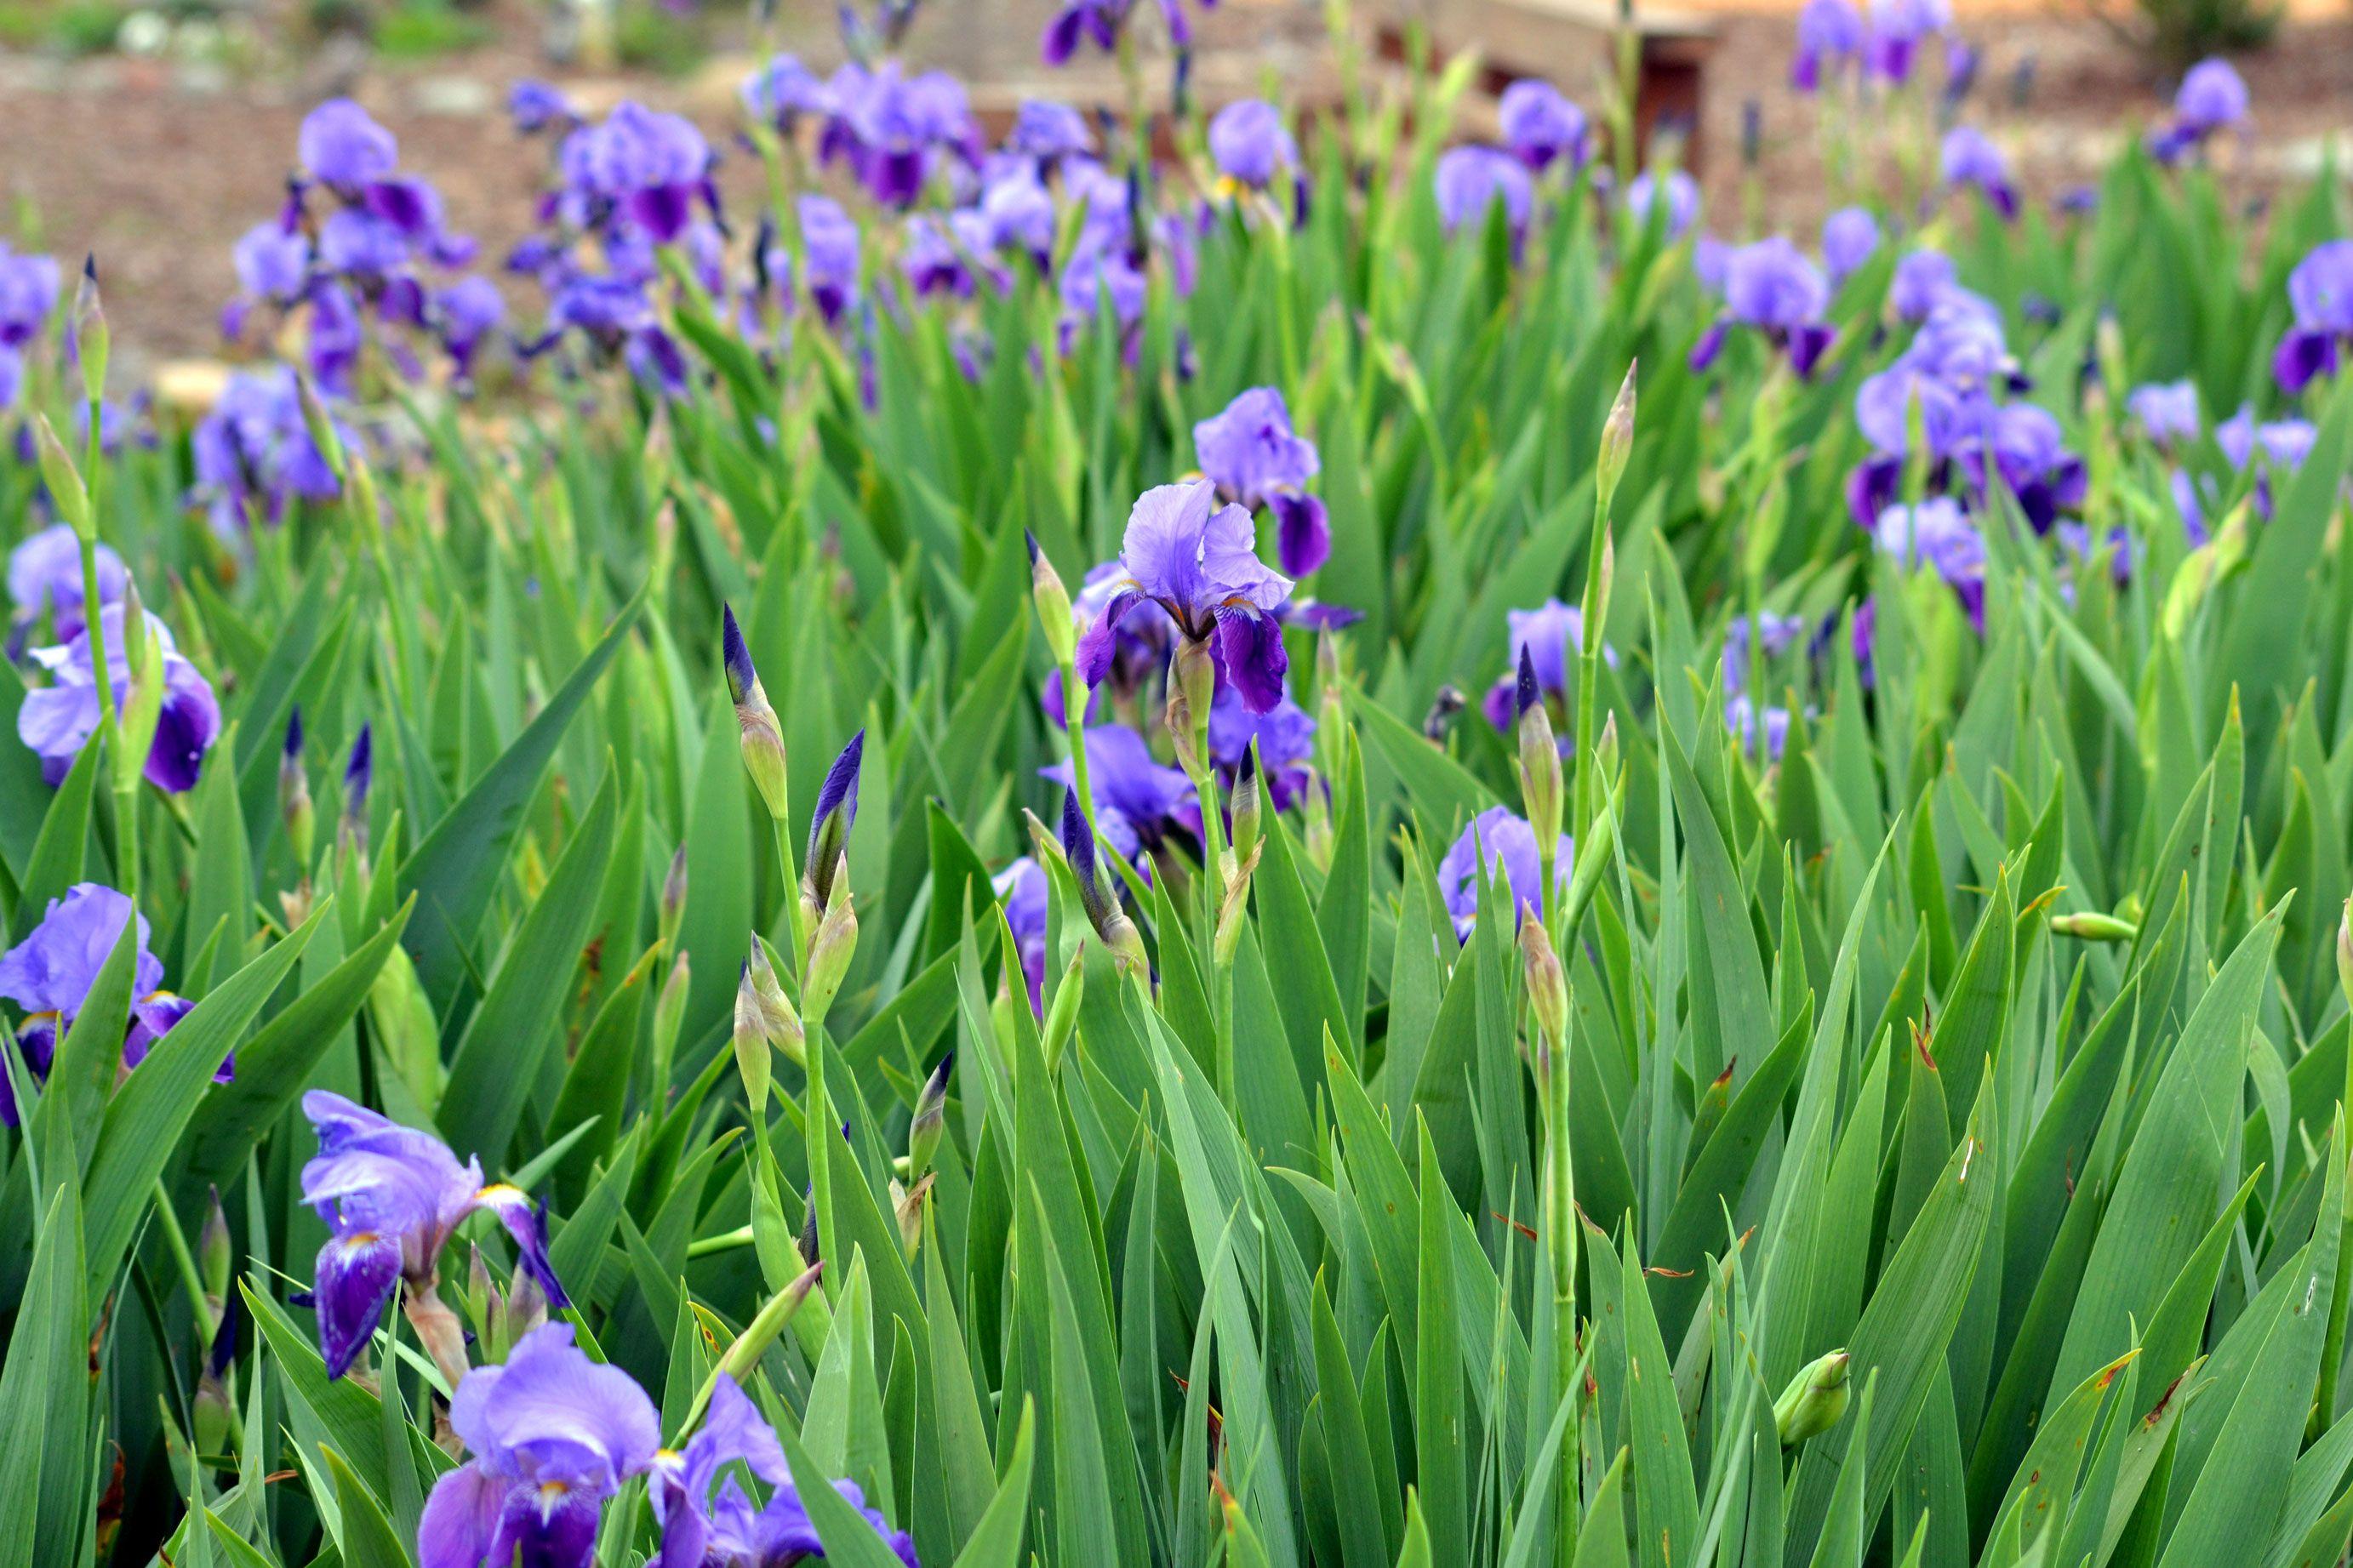 Pictures of iris flowers of flowers the iris means faith hope pictures of iris flowers of flowers the iris means faith hope and wisdom the purple iris izmirmasajfo